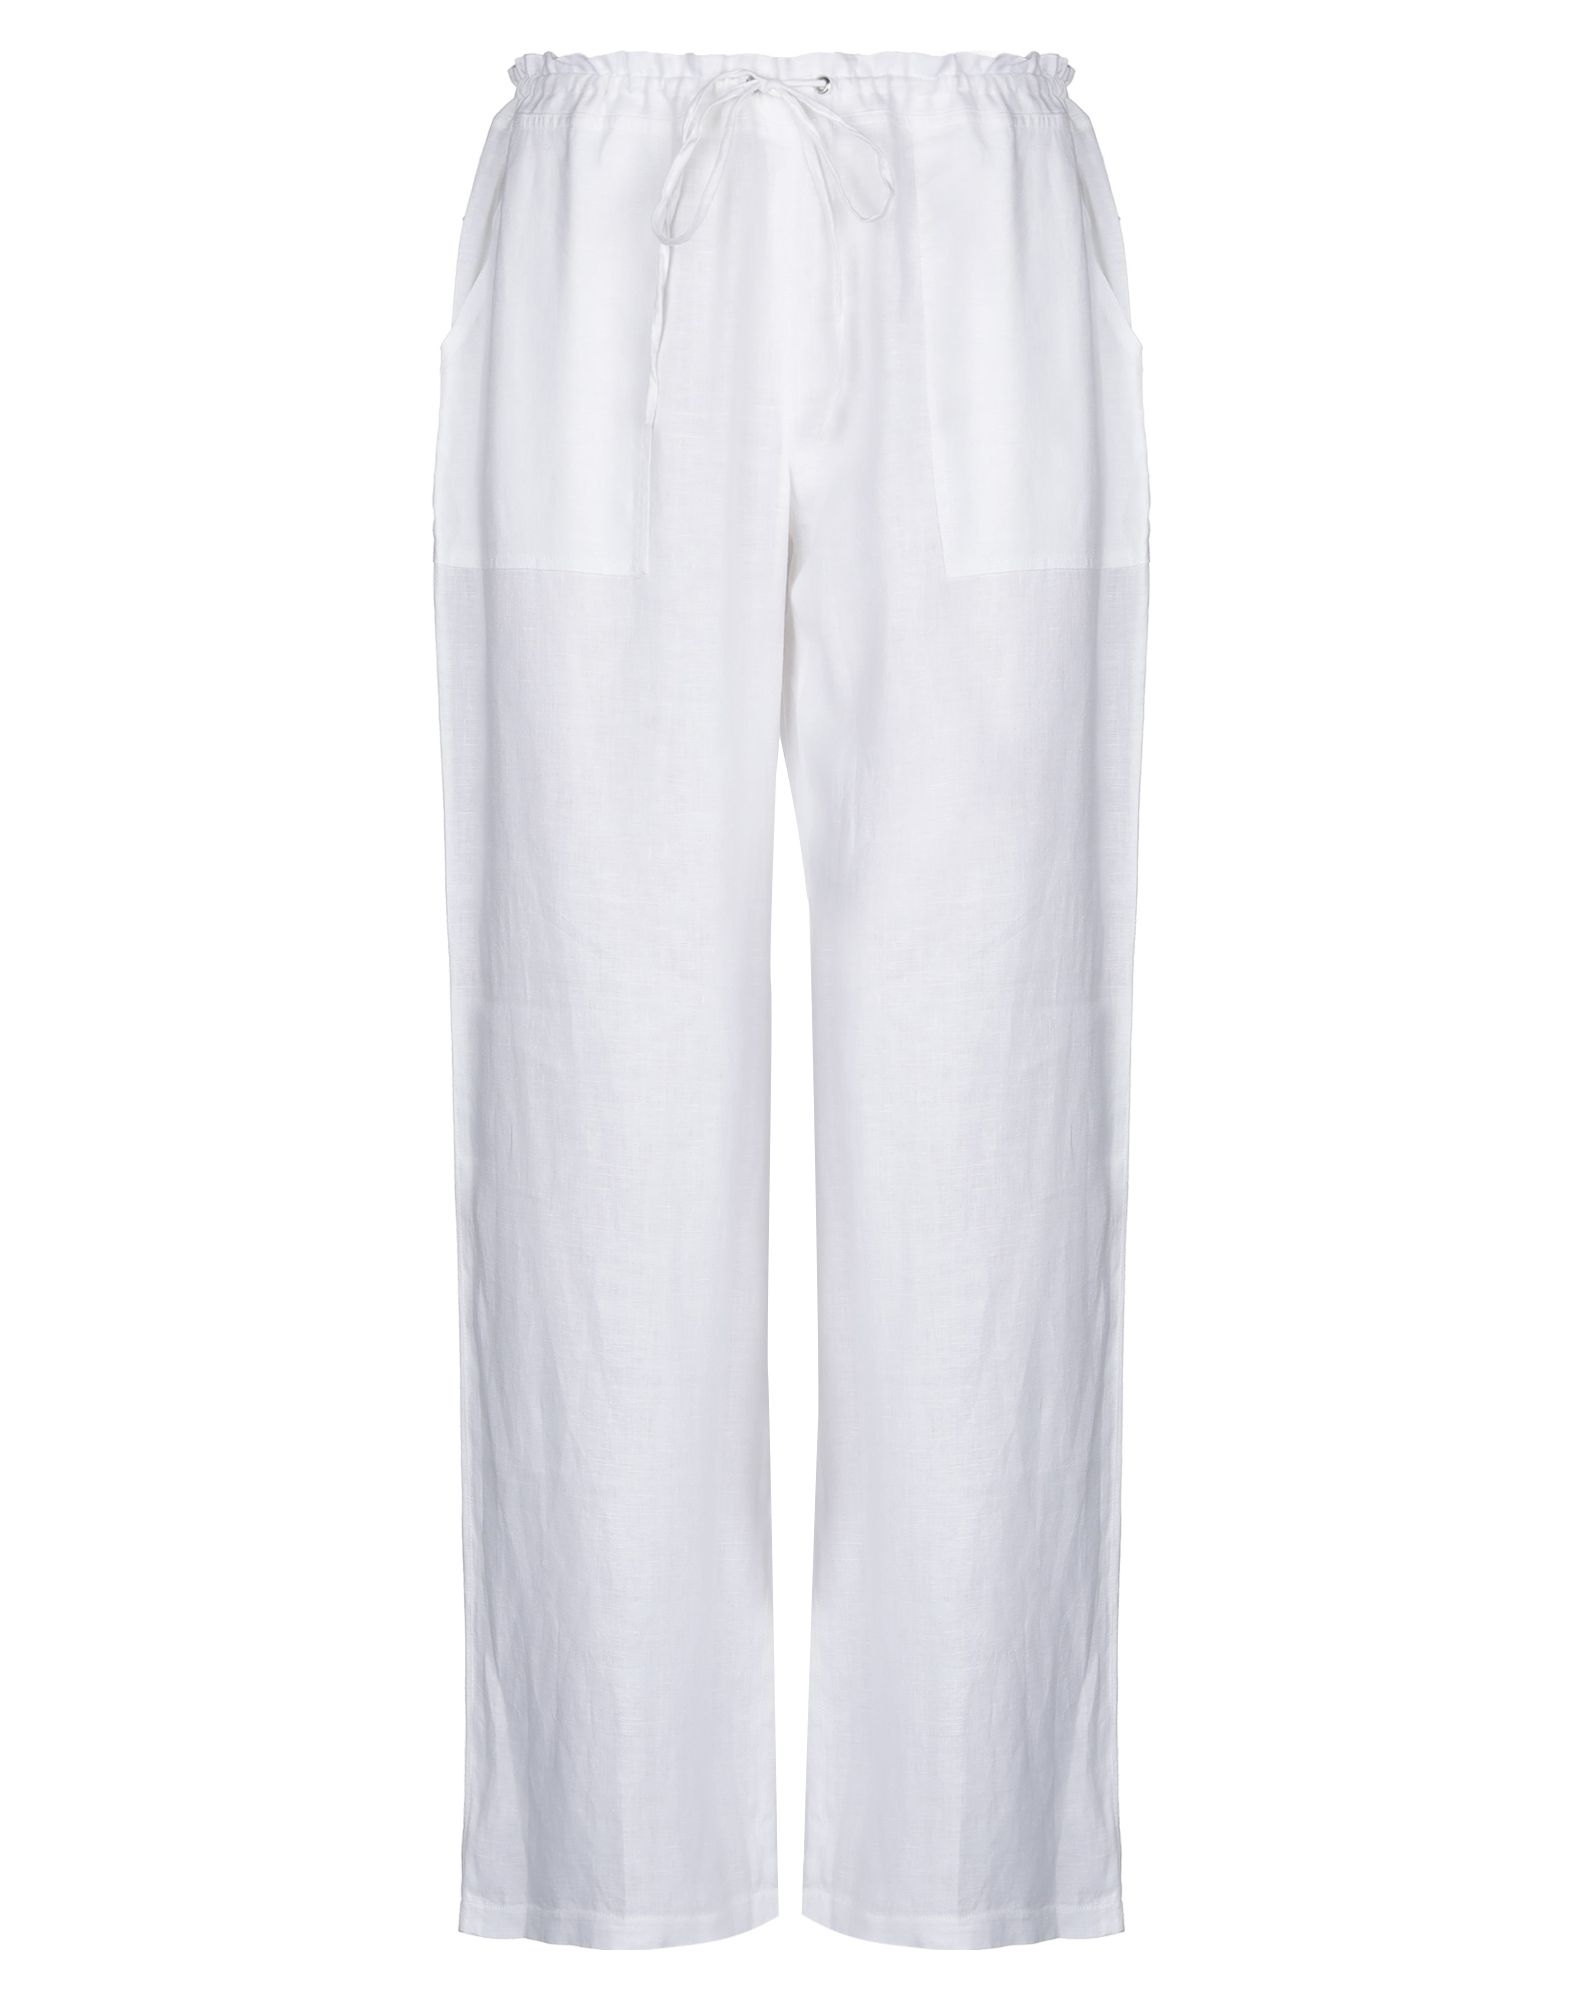 ANNACLUB BY LA PERLA Повседневные брюки agatha ruiz de la prada повседневные брюки